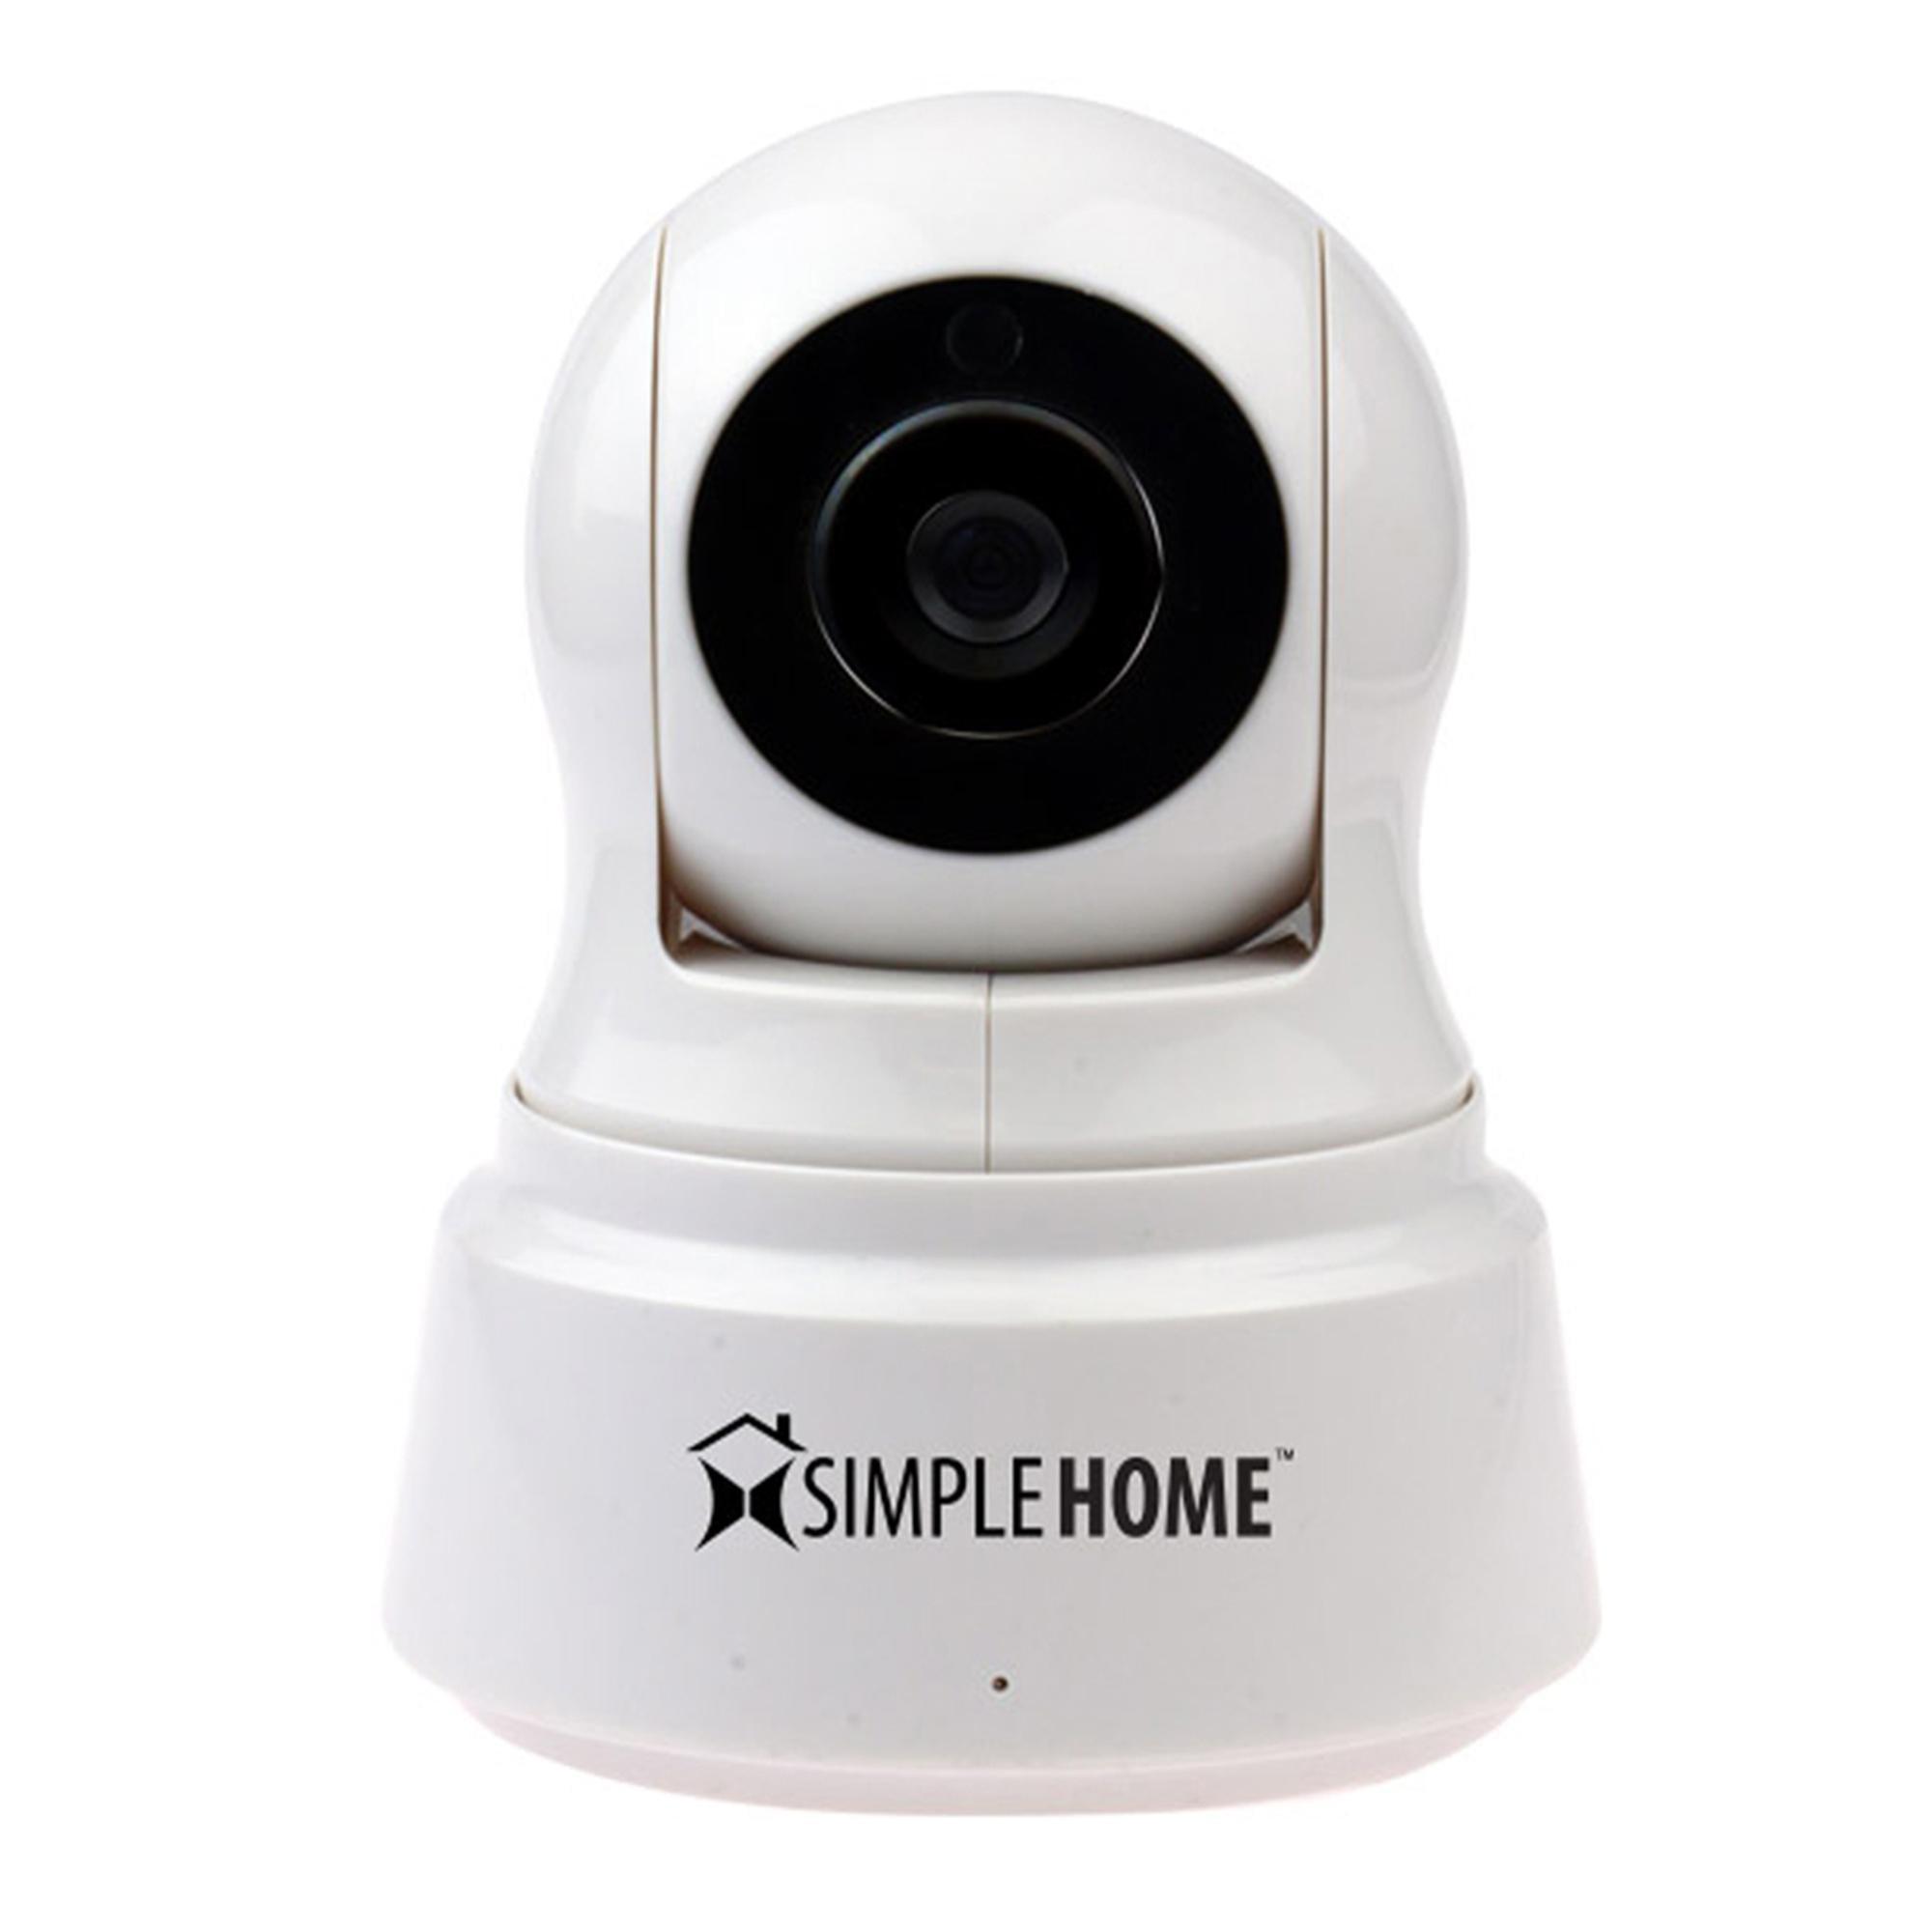 Supplier Generic Simplehome Smart Pan & Tilt Wi - fi Security Camera